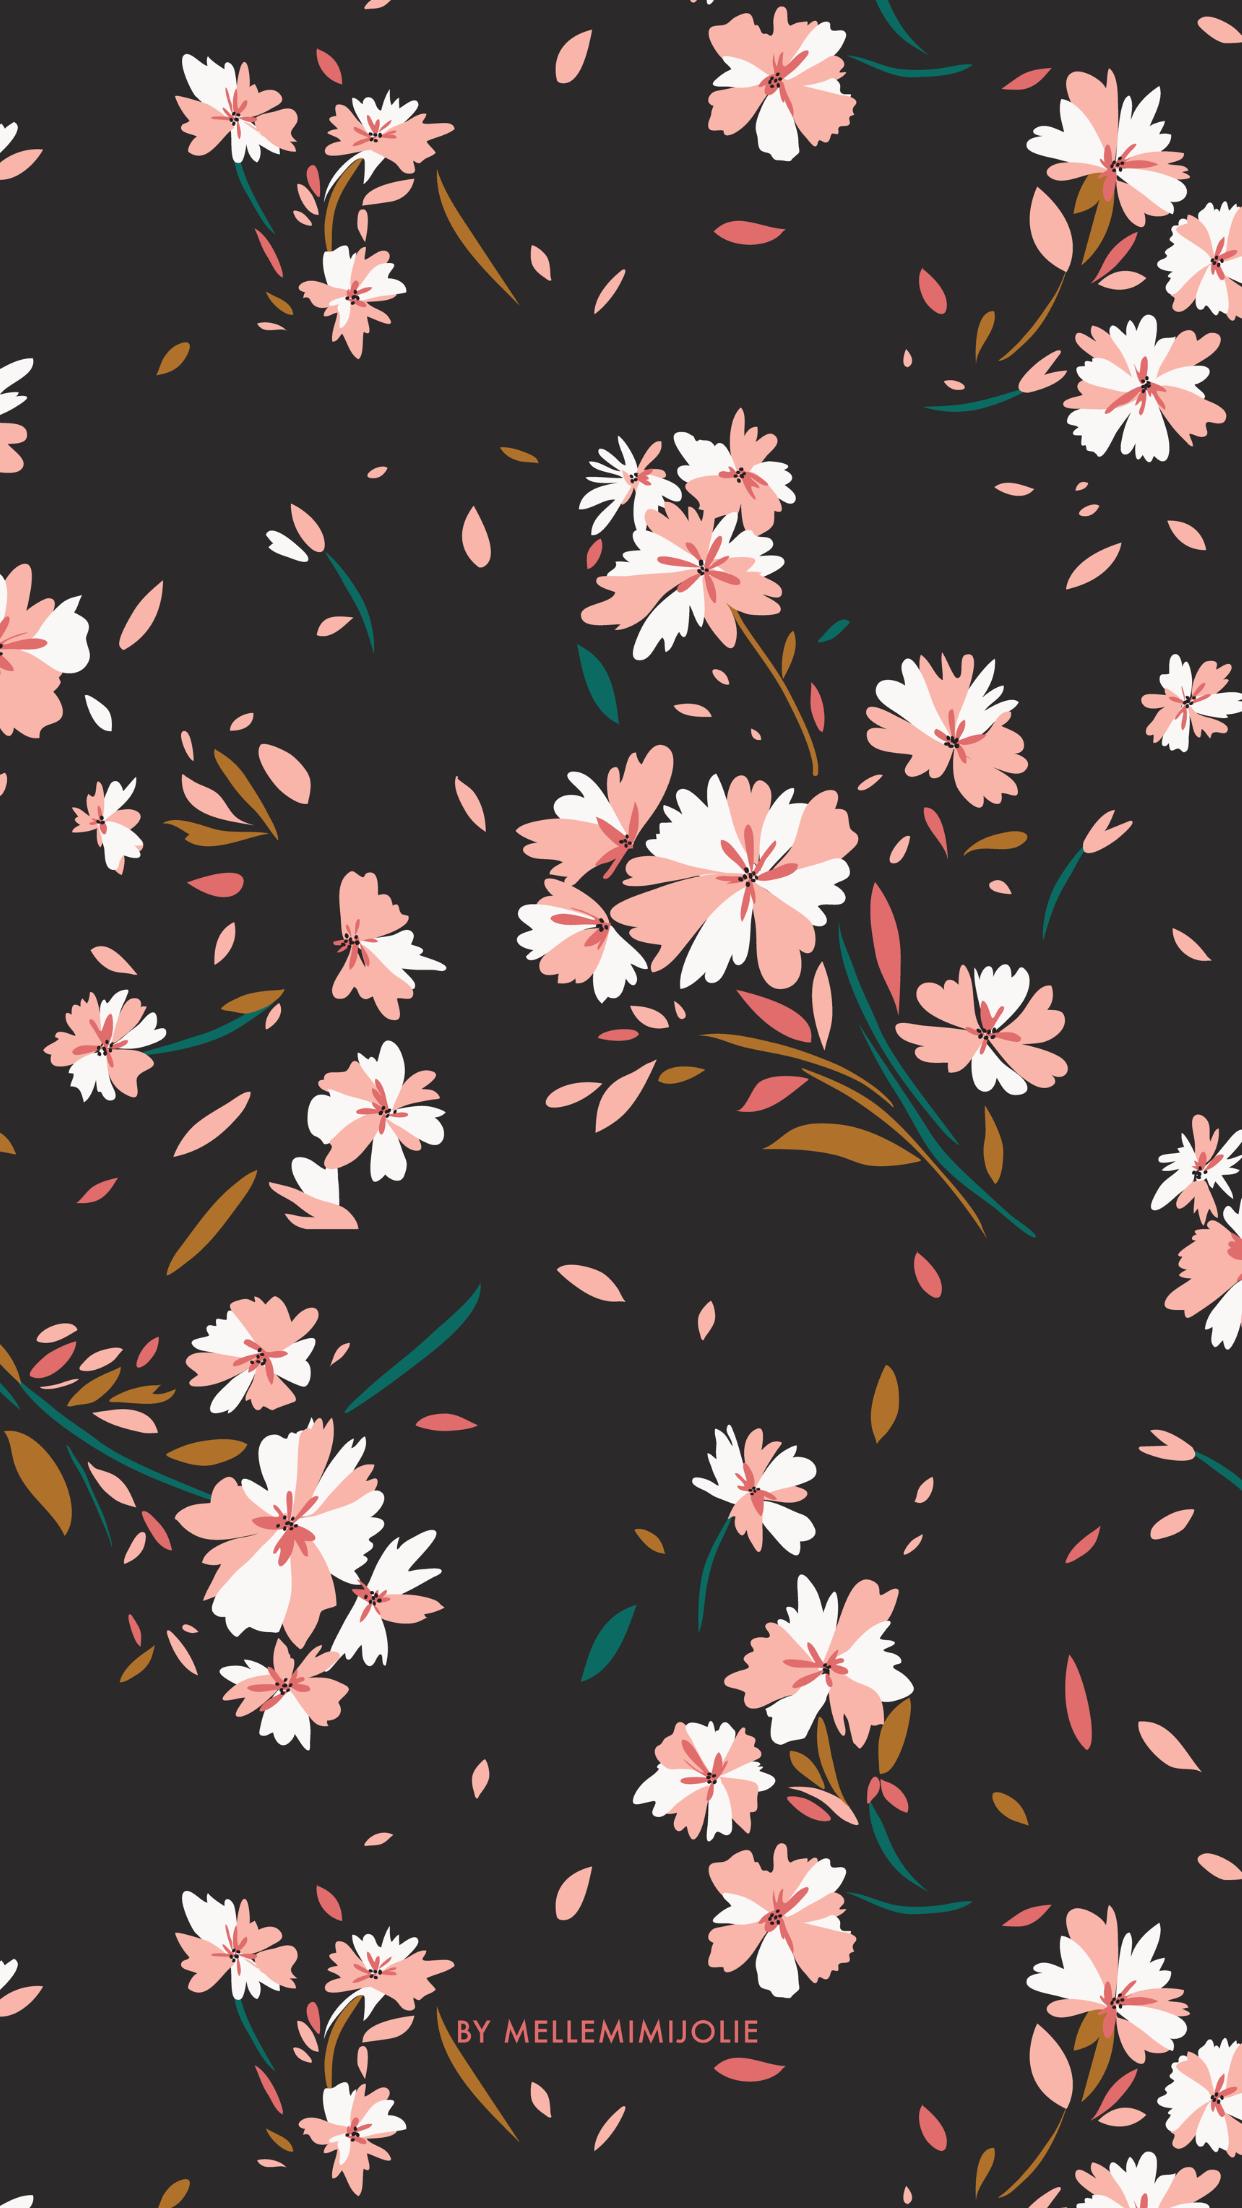 Wallpaper Iphone Wallpaper Able Pinterest Fondos